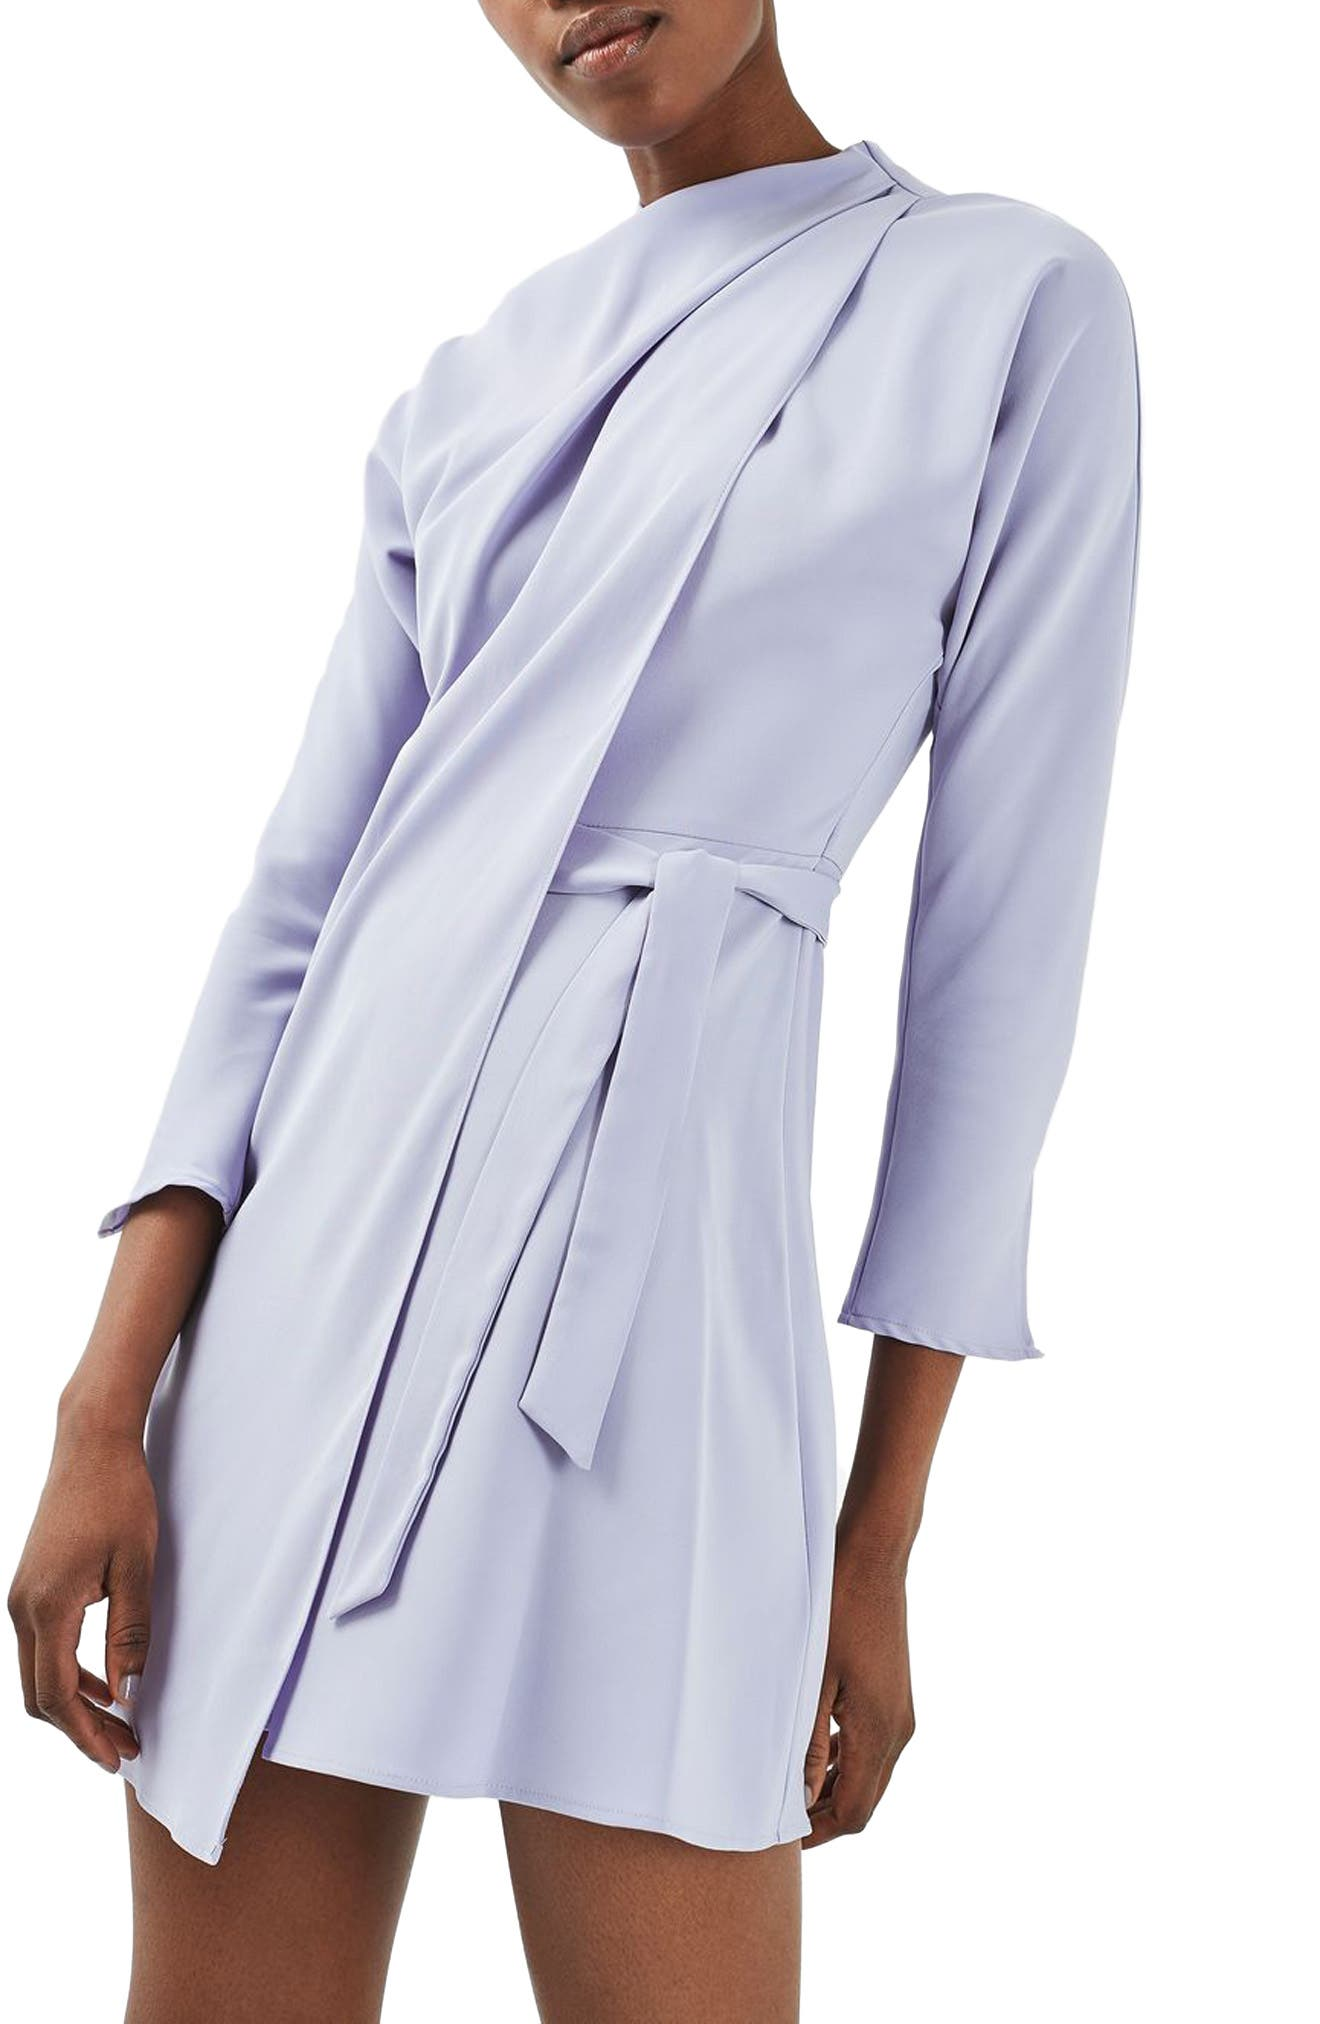 Main Image - Topshop Drape Neck Dress